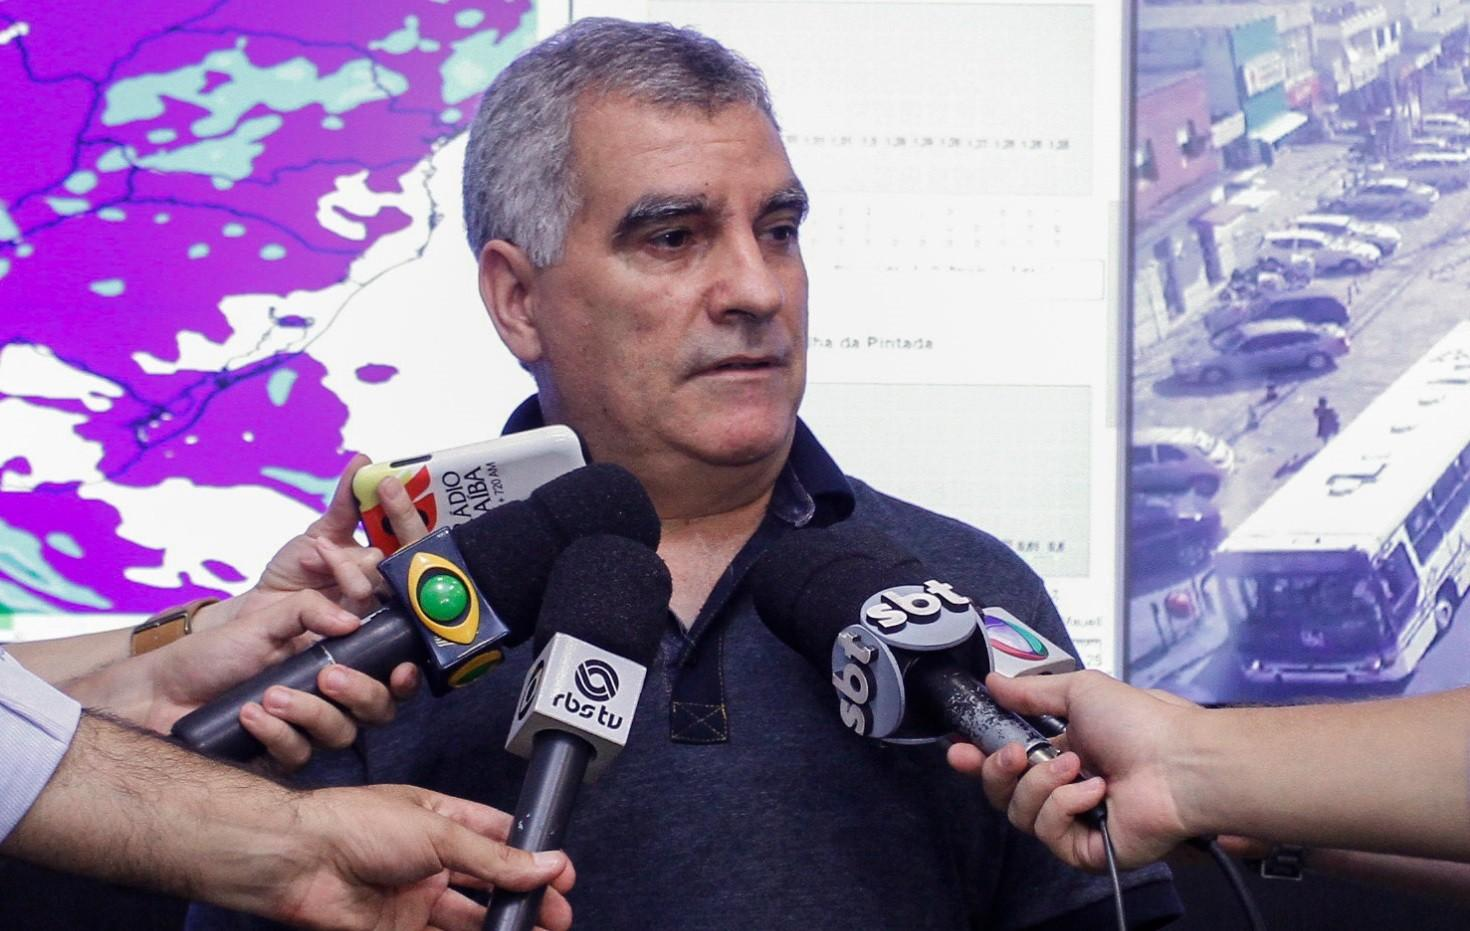 Luiz Fernando Nachtigall